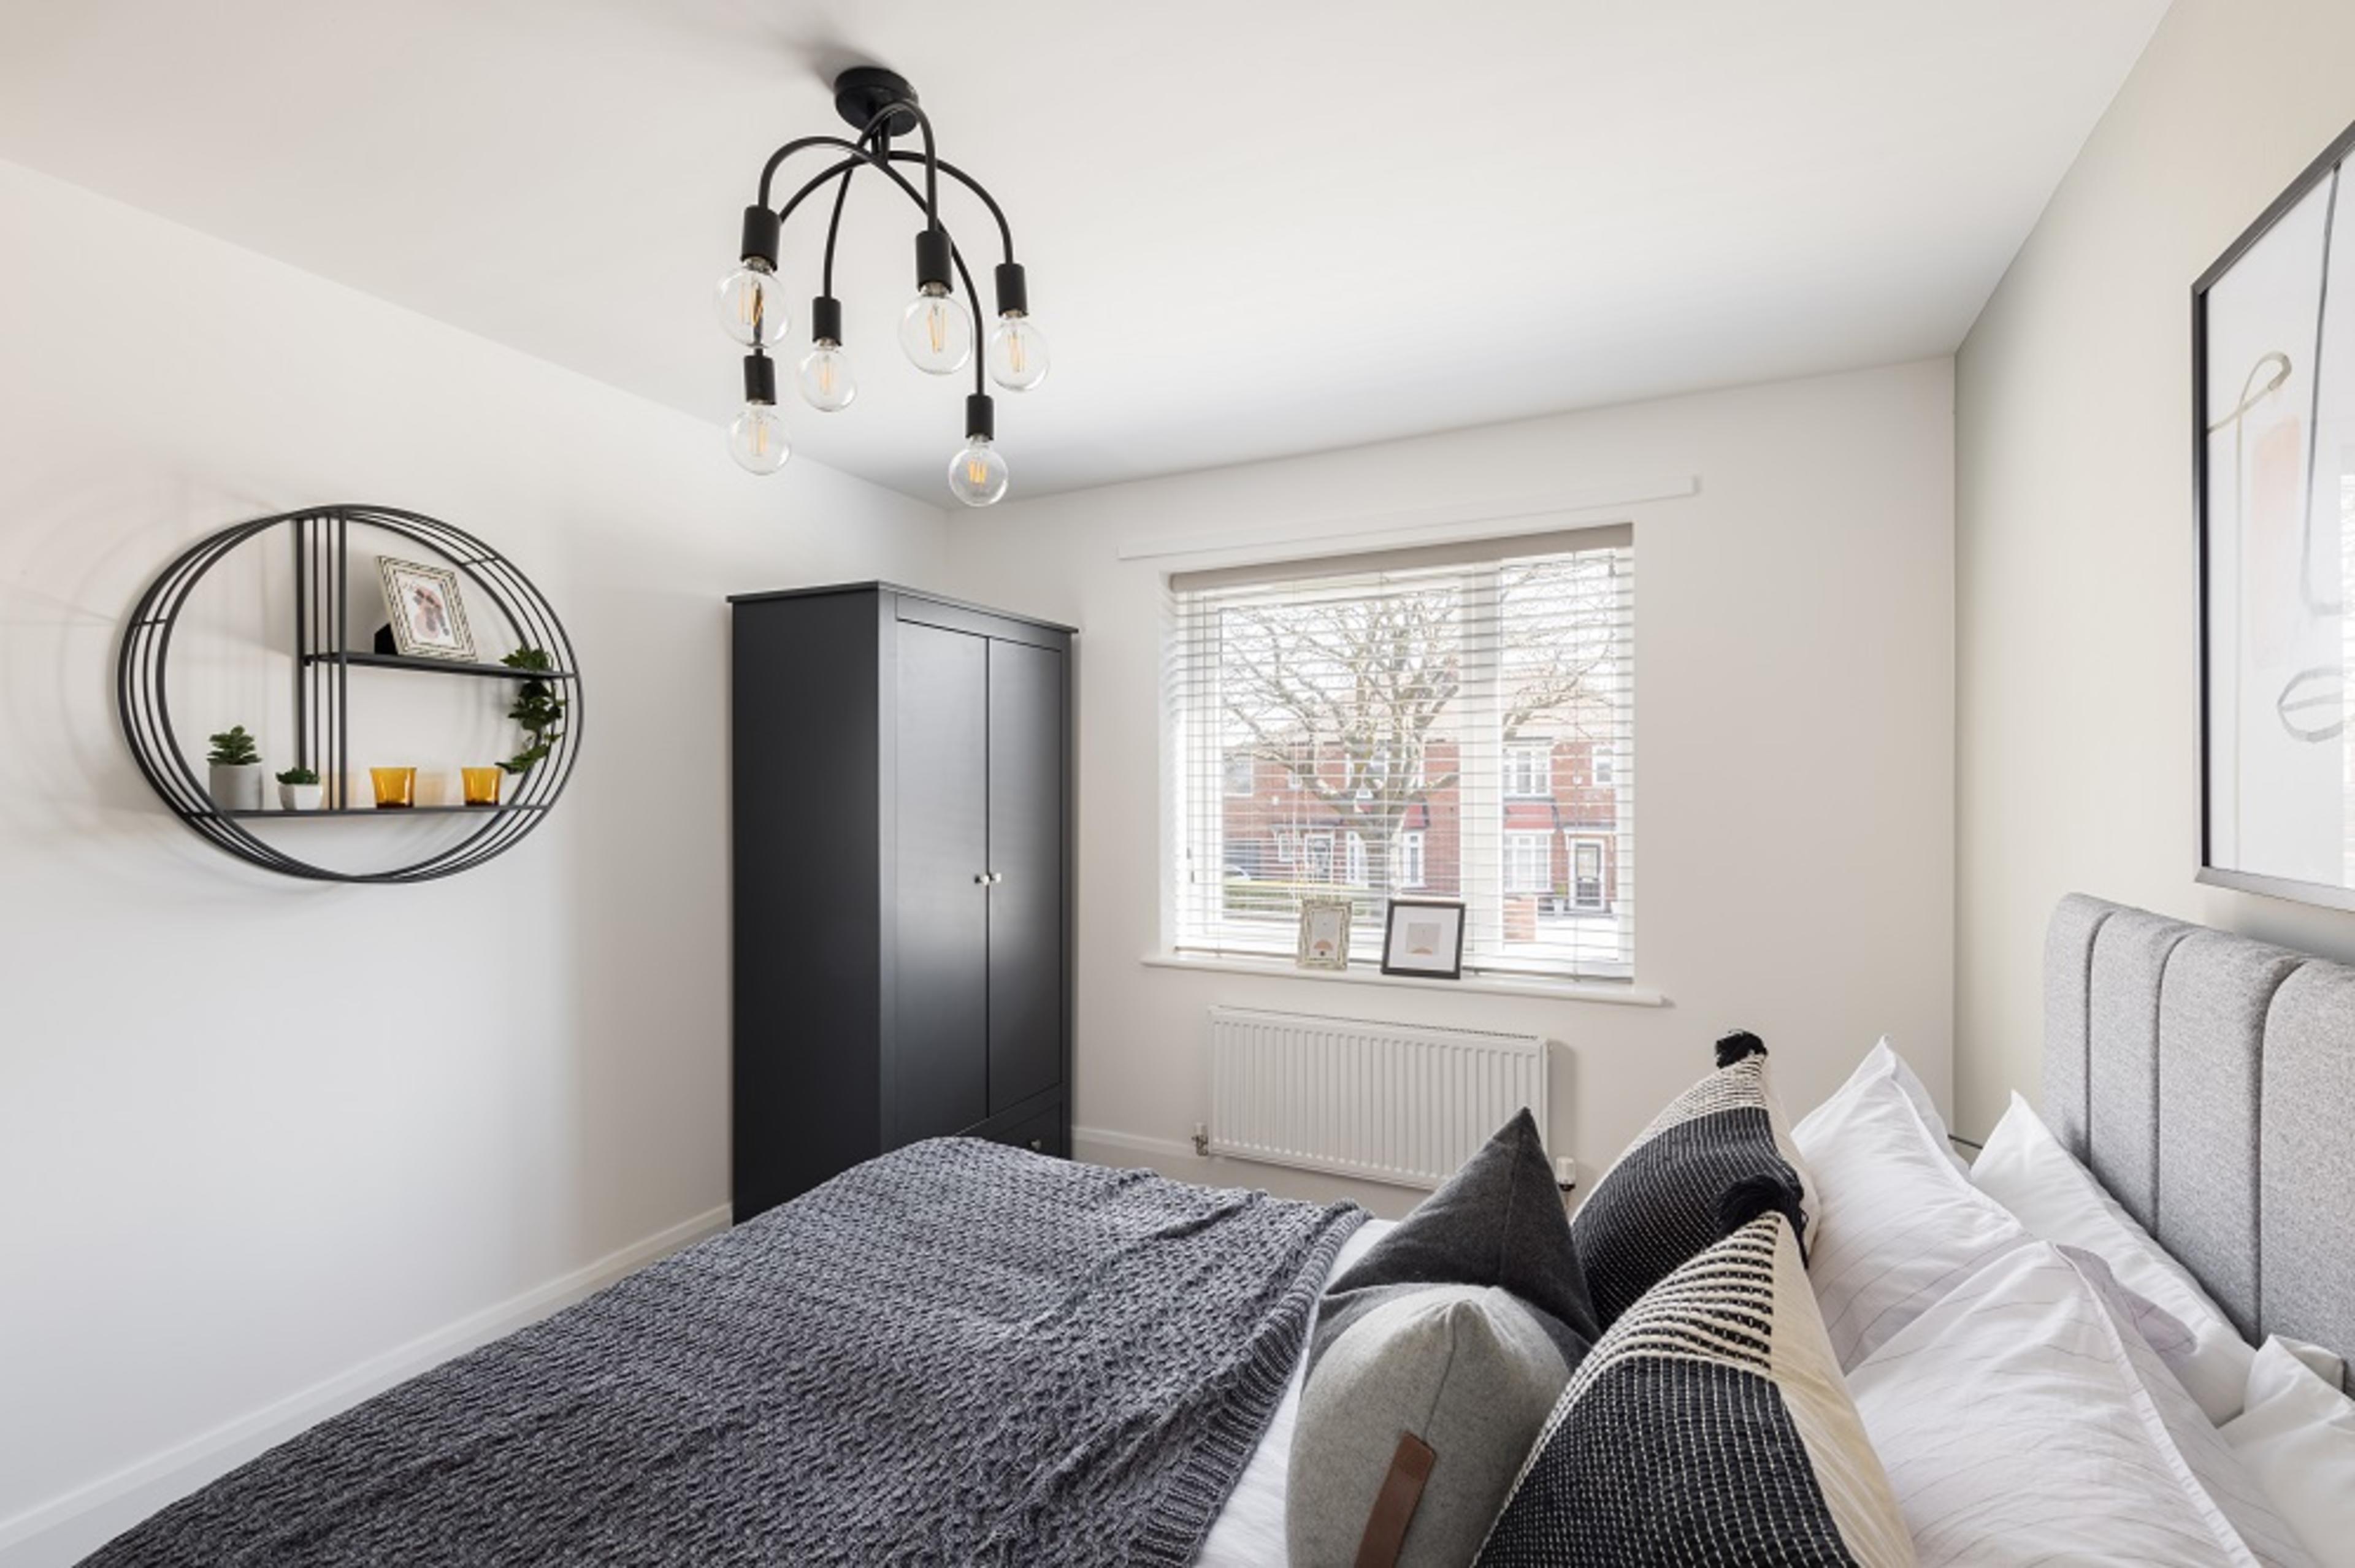 woolner-brook-hector-bedroom-3